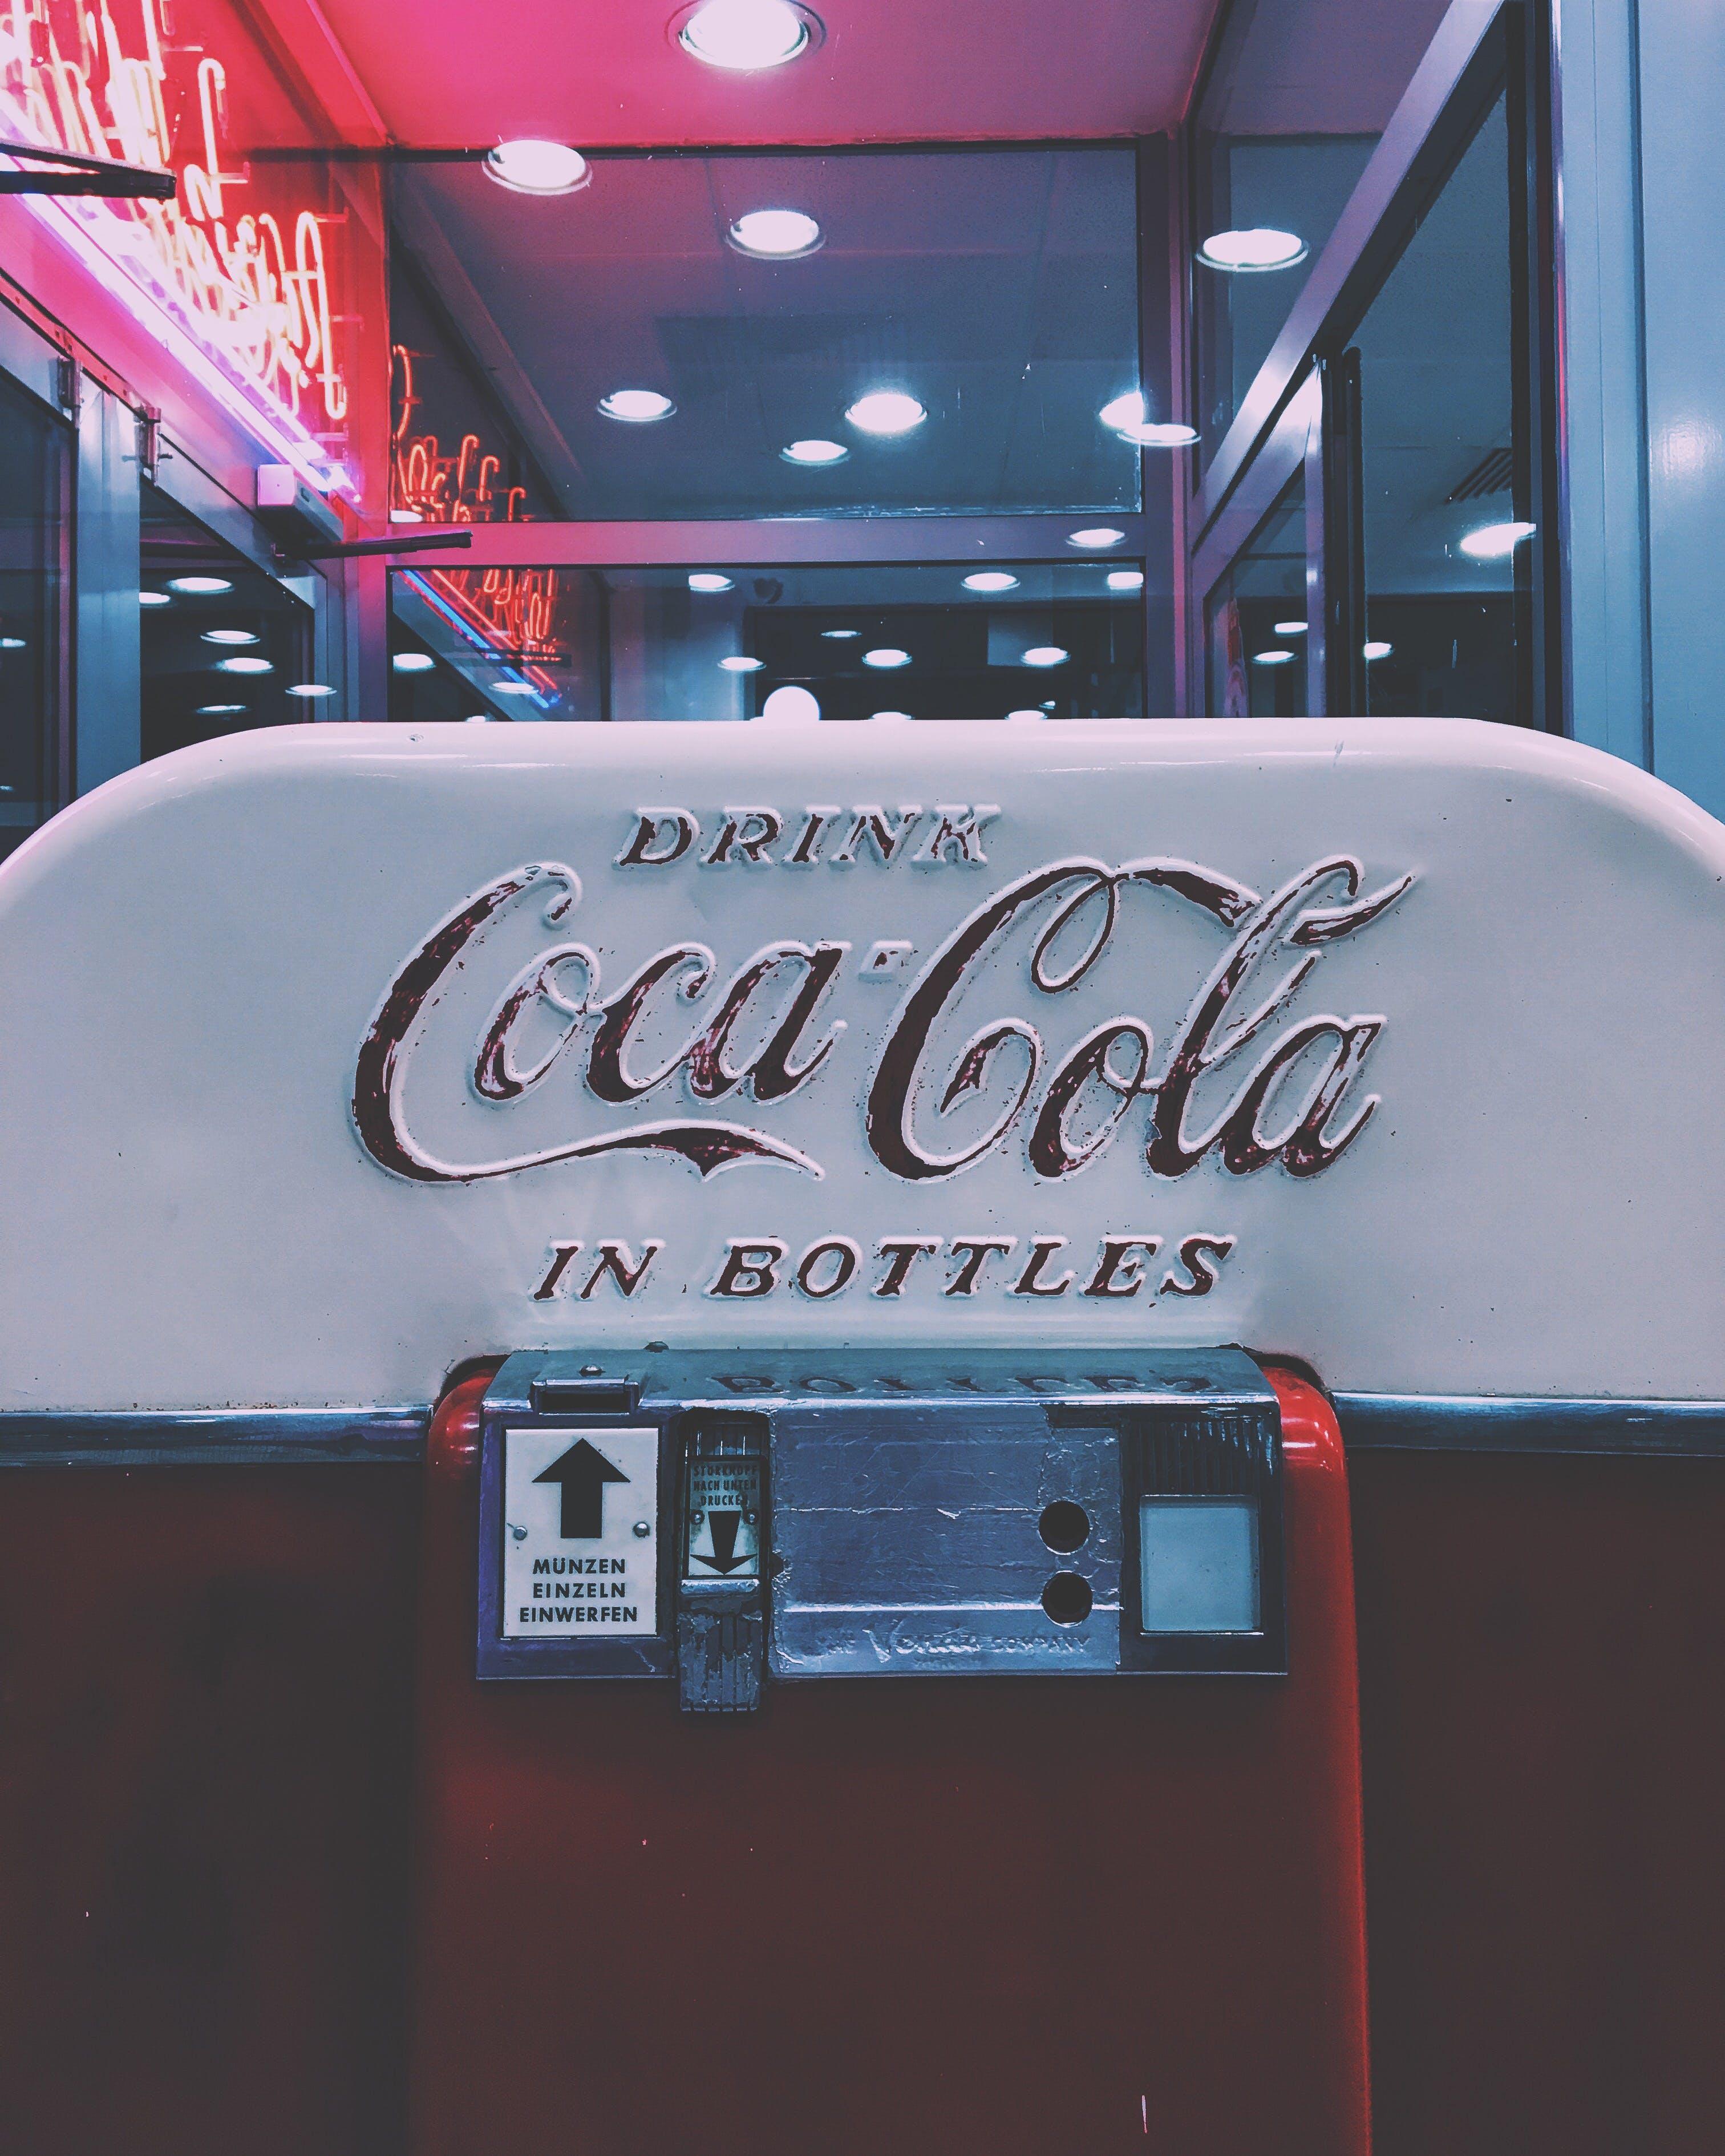 Kostenloses Stock Foto zu beleuchtung, business, coca cola, geschäfte